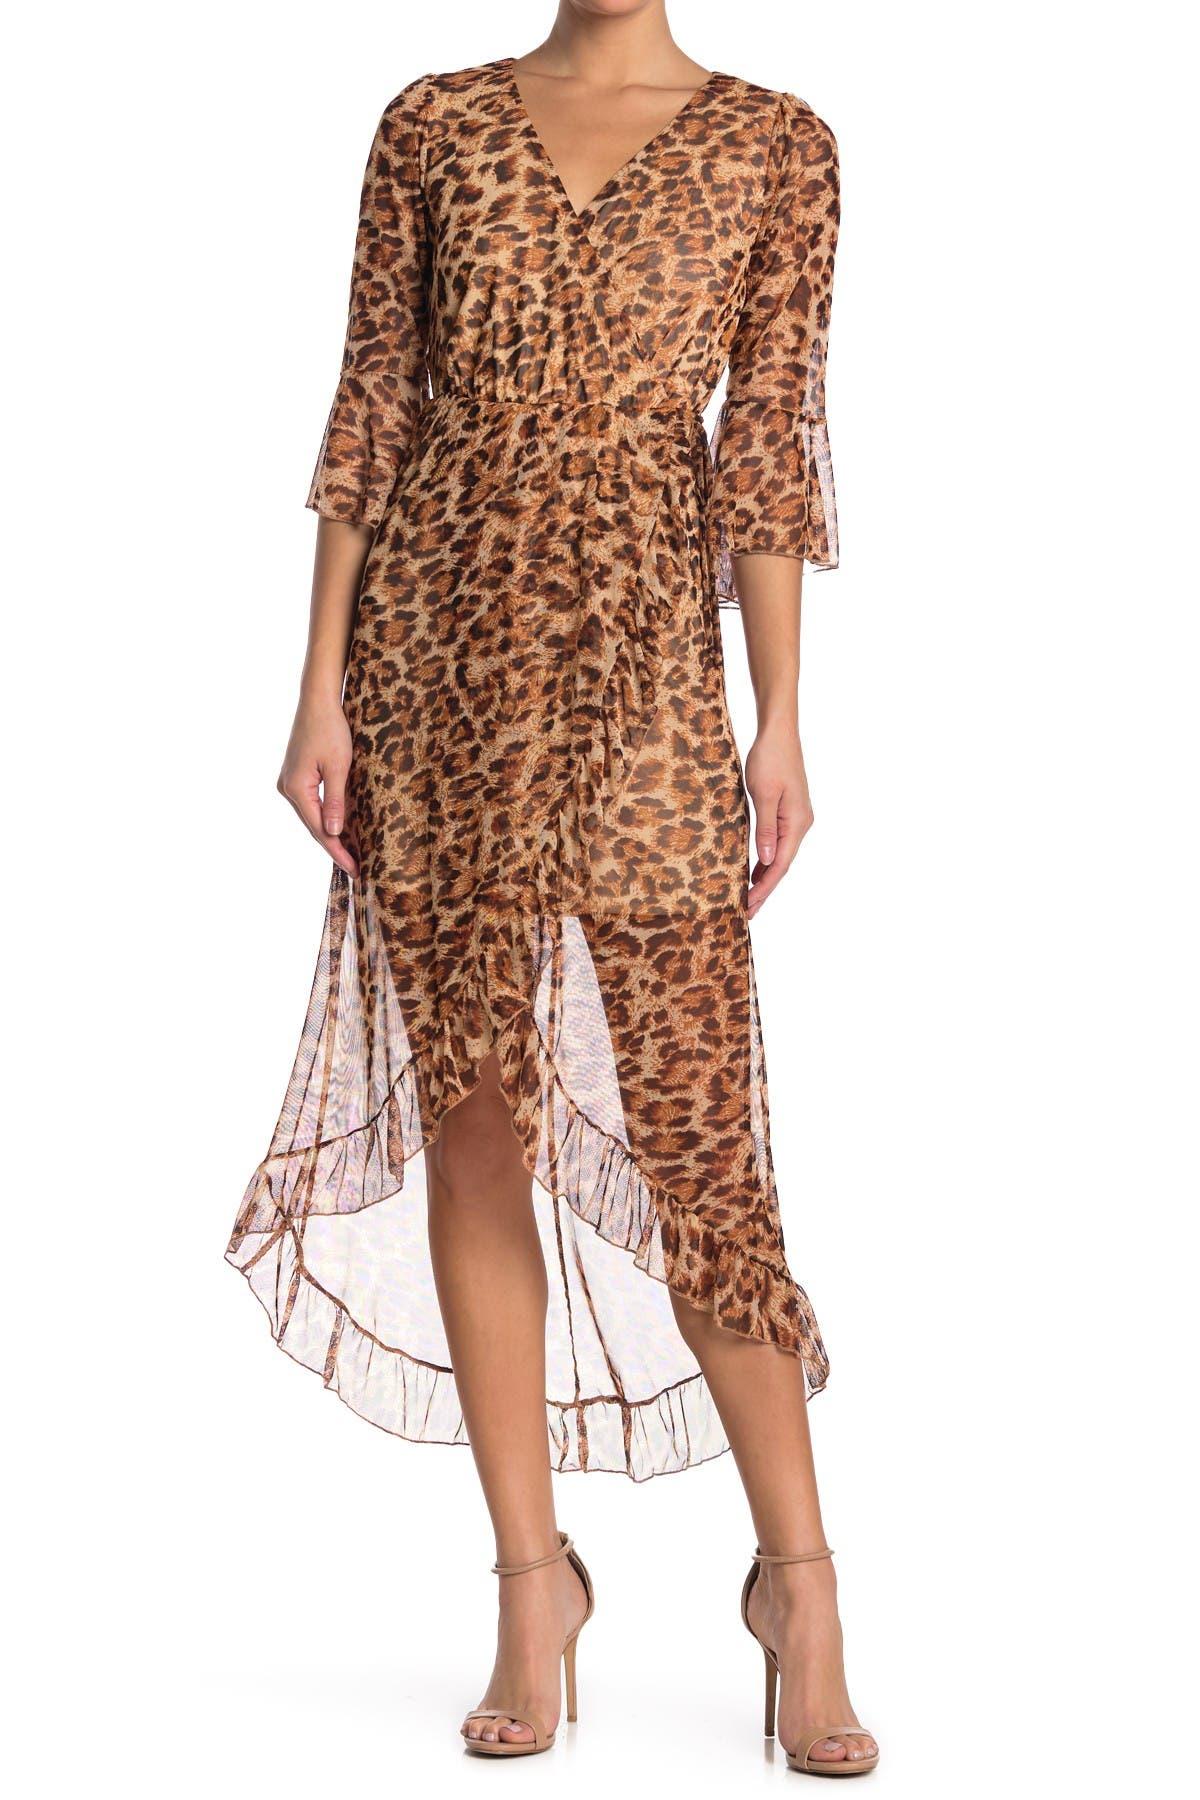 Image of KENEDIK Leopard Print Mesh 3/4 Sleeve High/Low Dress